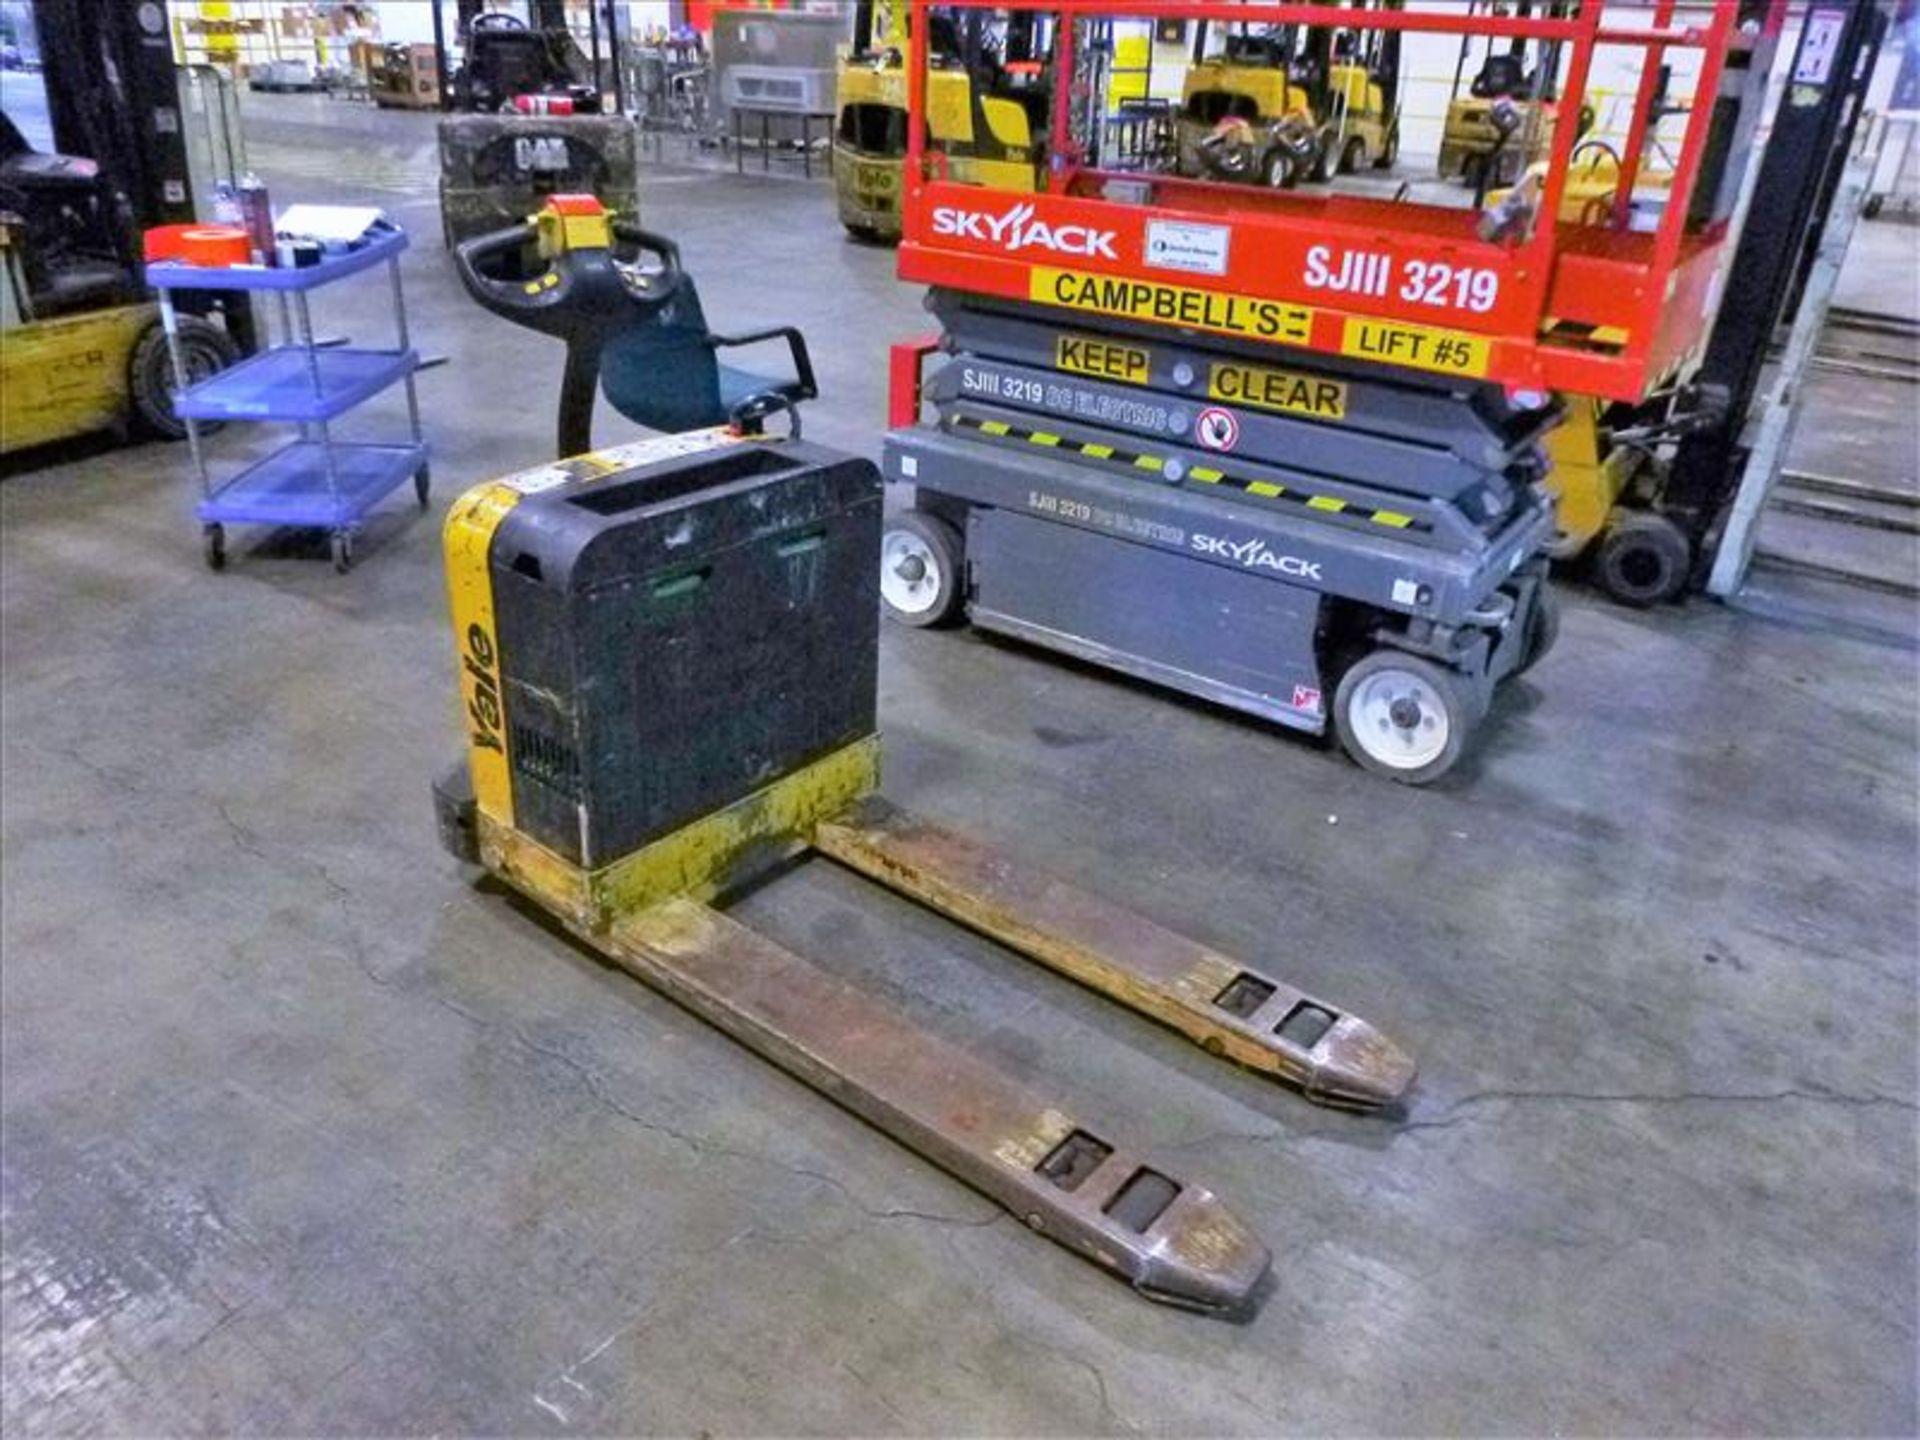 Yale walk-behind pallet truck, mod. MPB040EN24T2748, ser. no. B827N16579C, 24V electric, 4000 lbs - Image 2 of 3